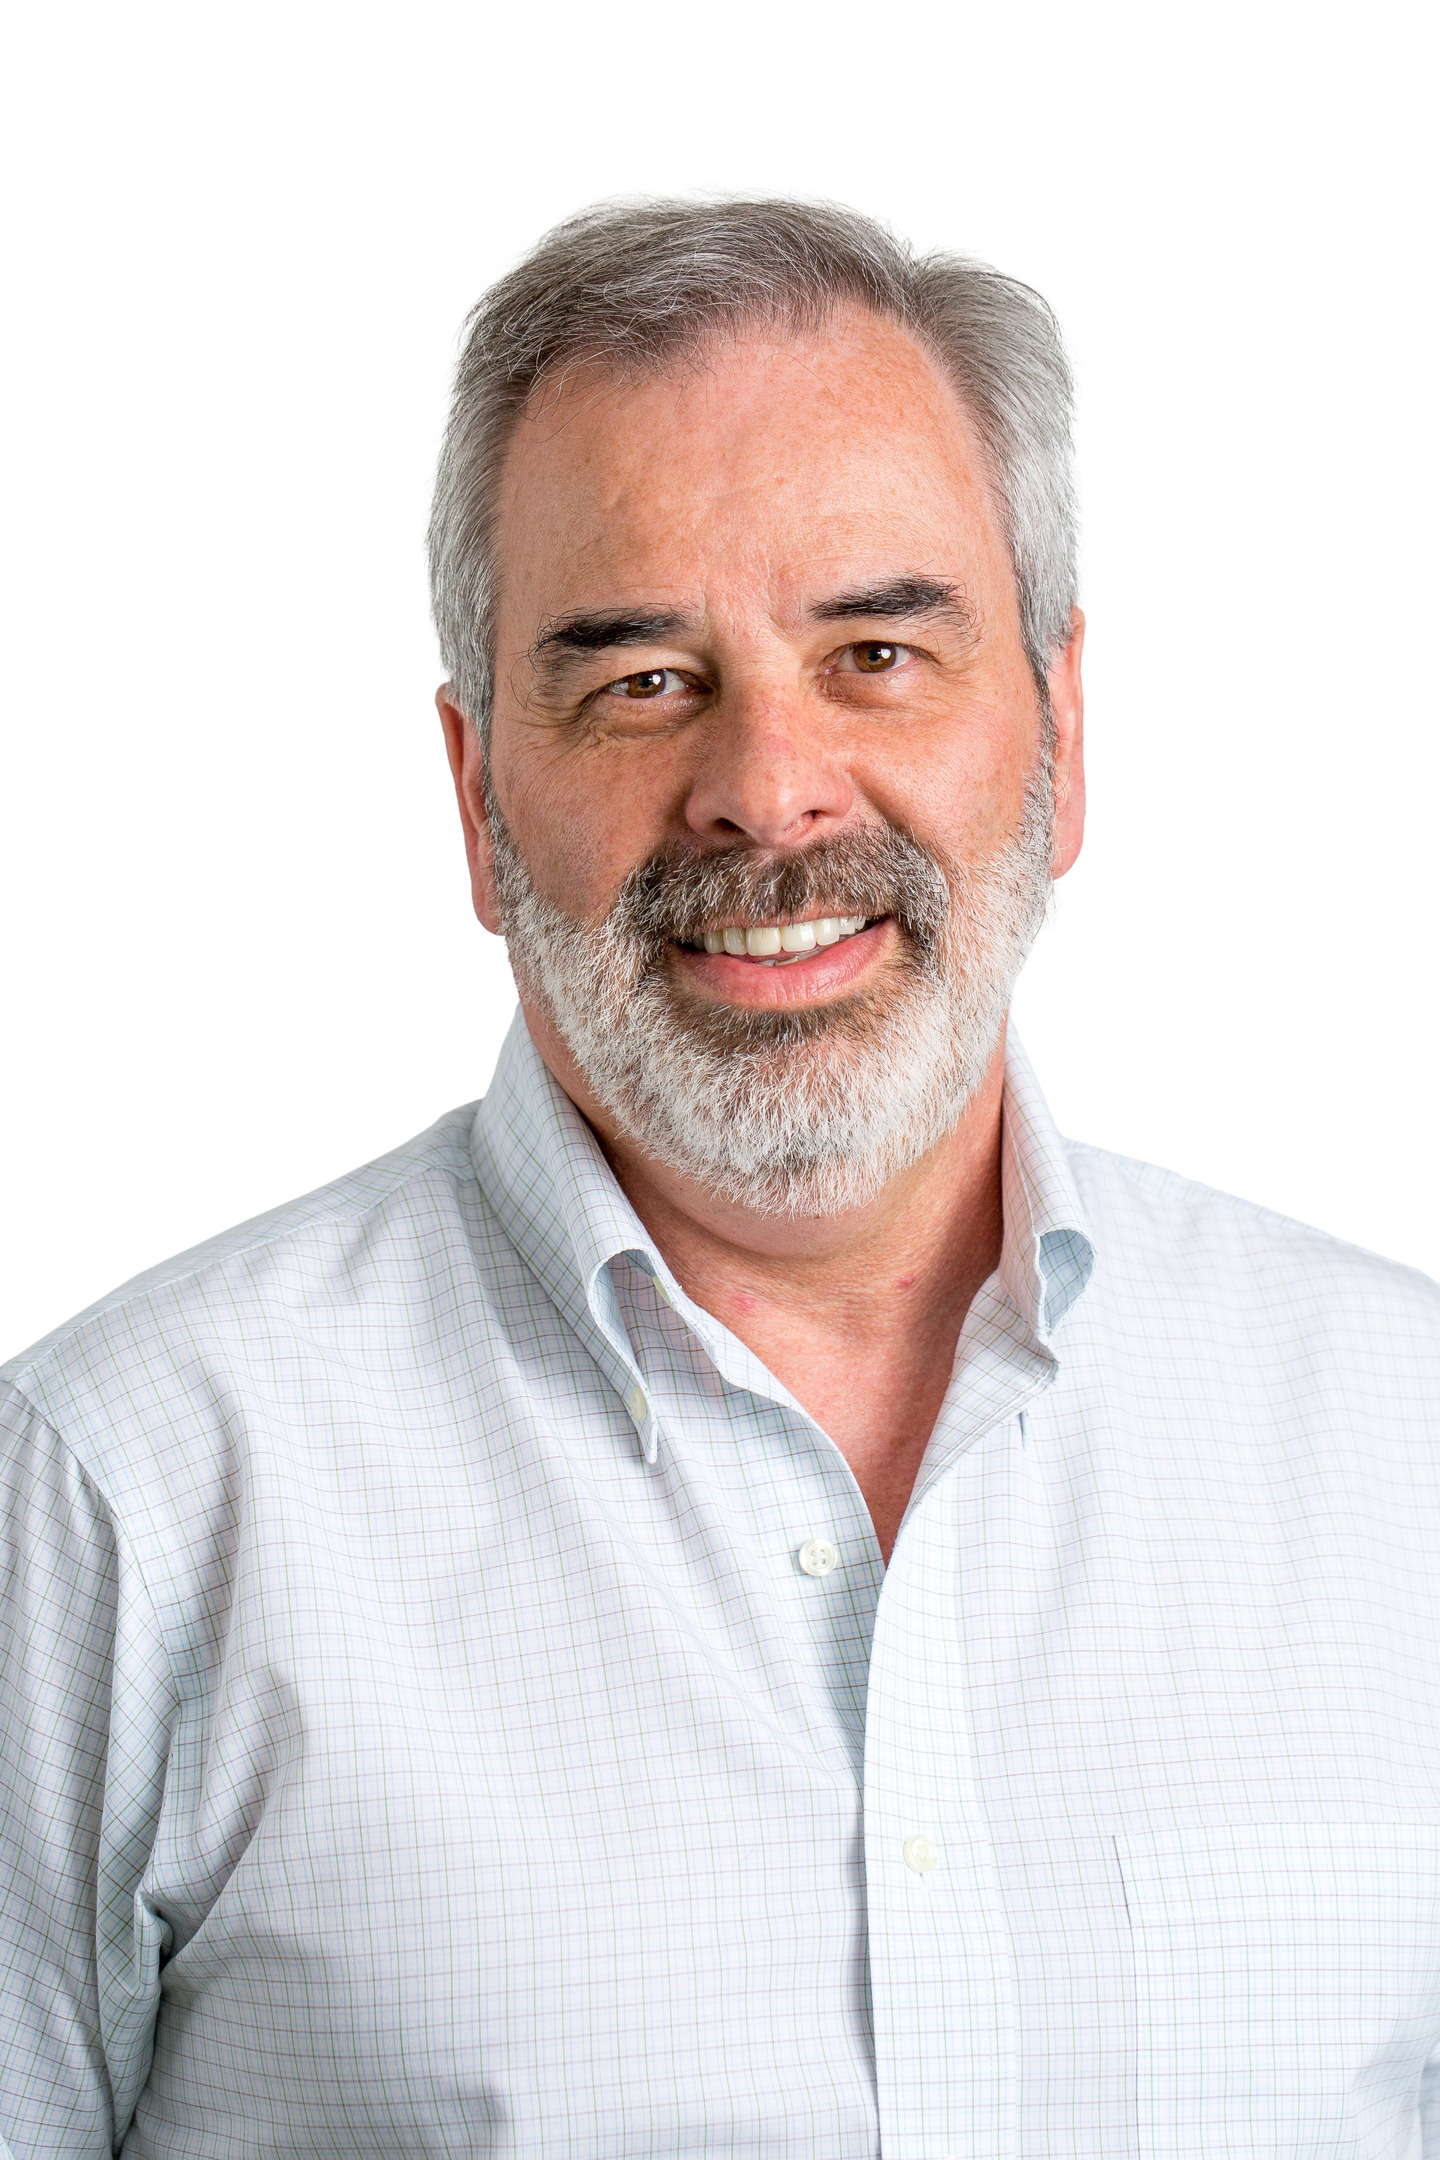 Jim Christie